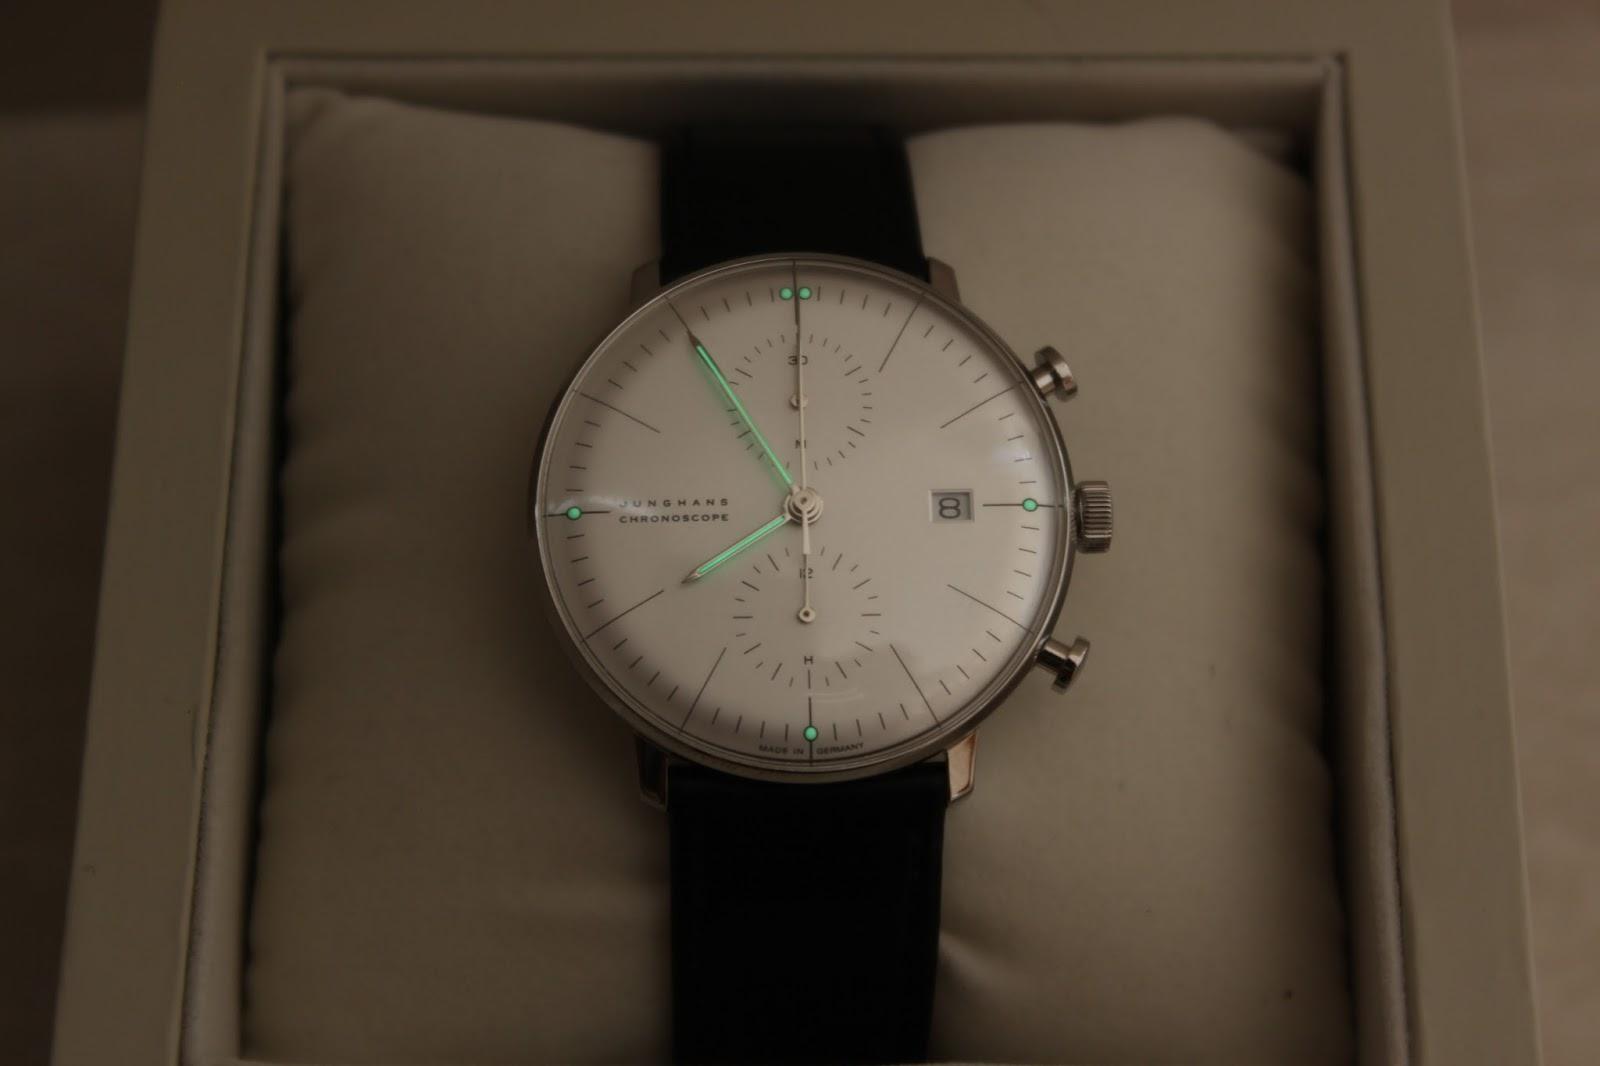 jam tangan branded sold bnib junghans max bill chronoscope. Black Bedroom Furniture Sets. Home Design Ideas